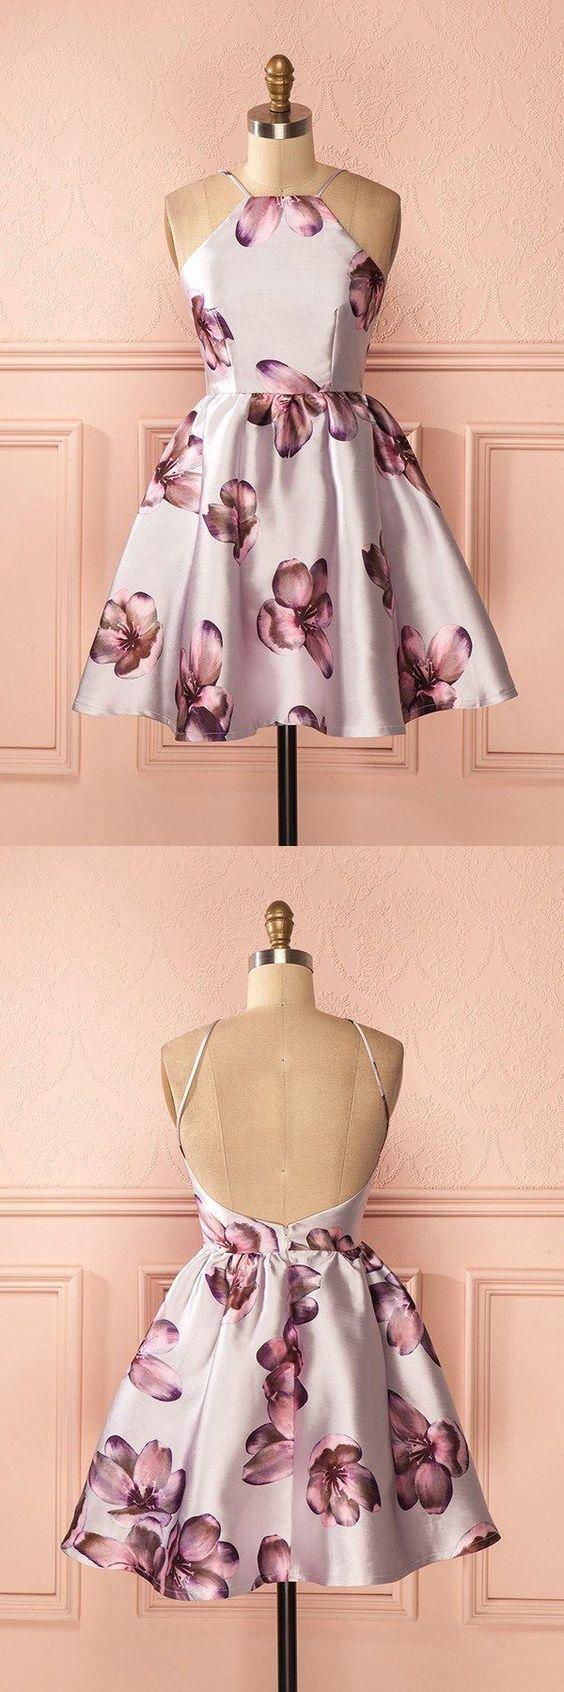 Short prom dresses simple floral homecoming dresses halter